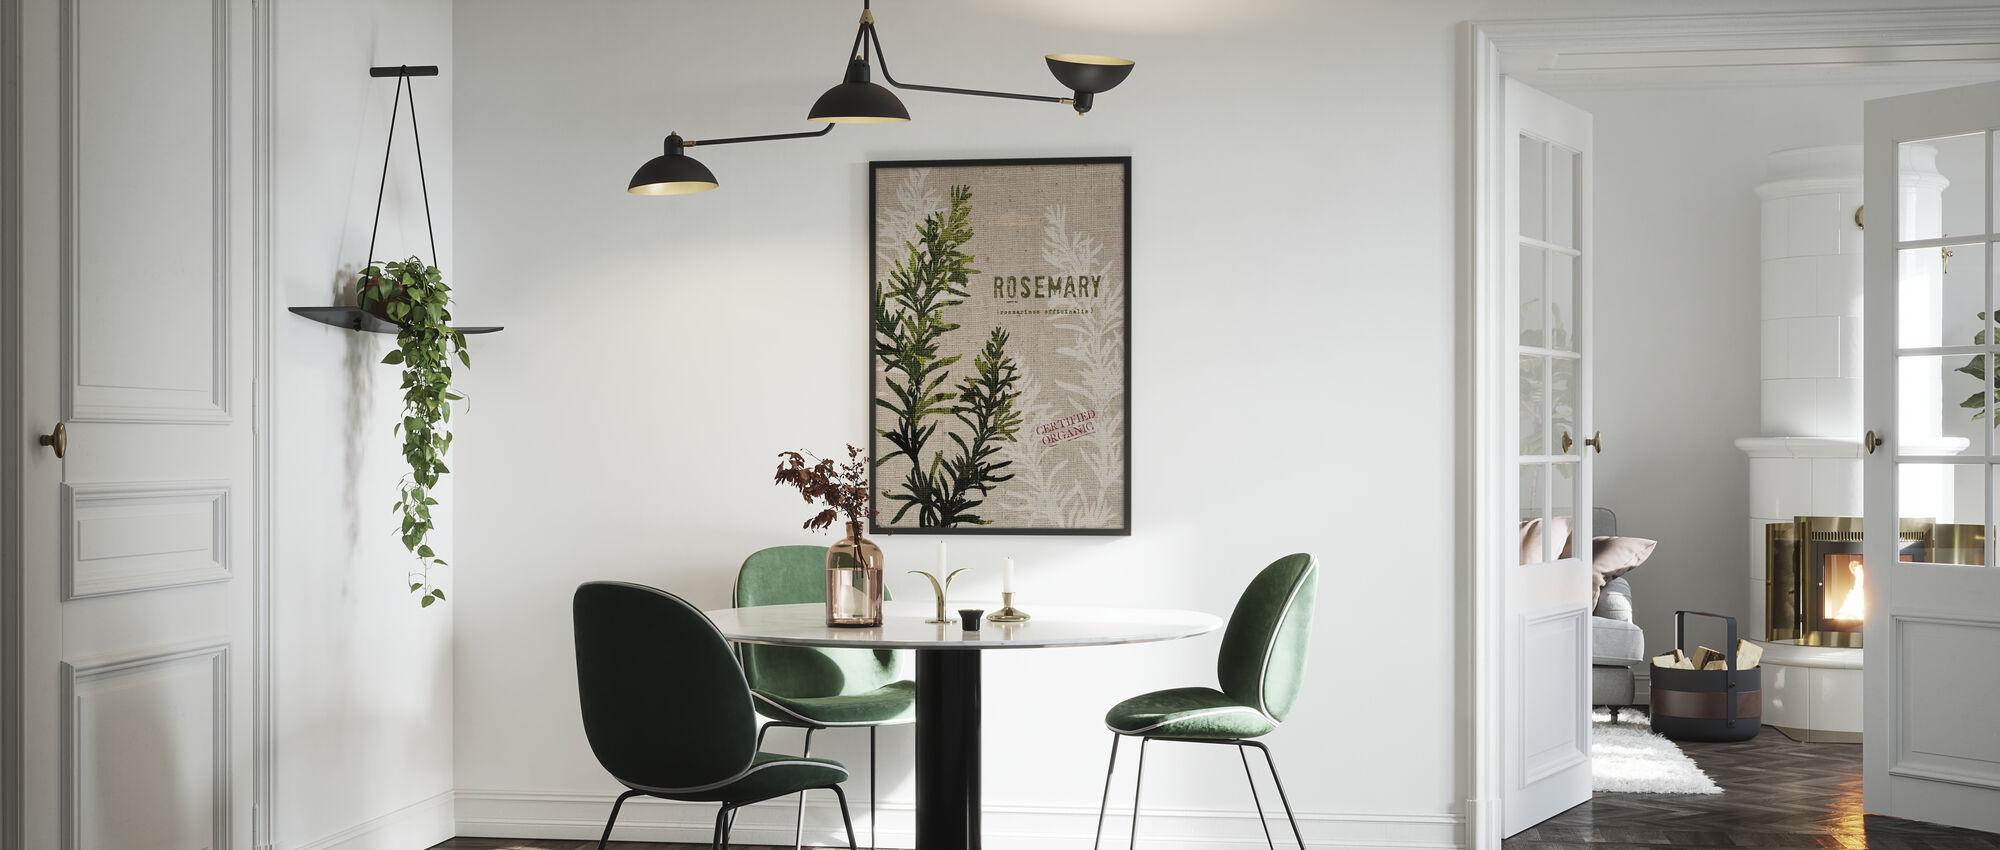 Organic Rosemary - Framed print - Kitchen